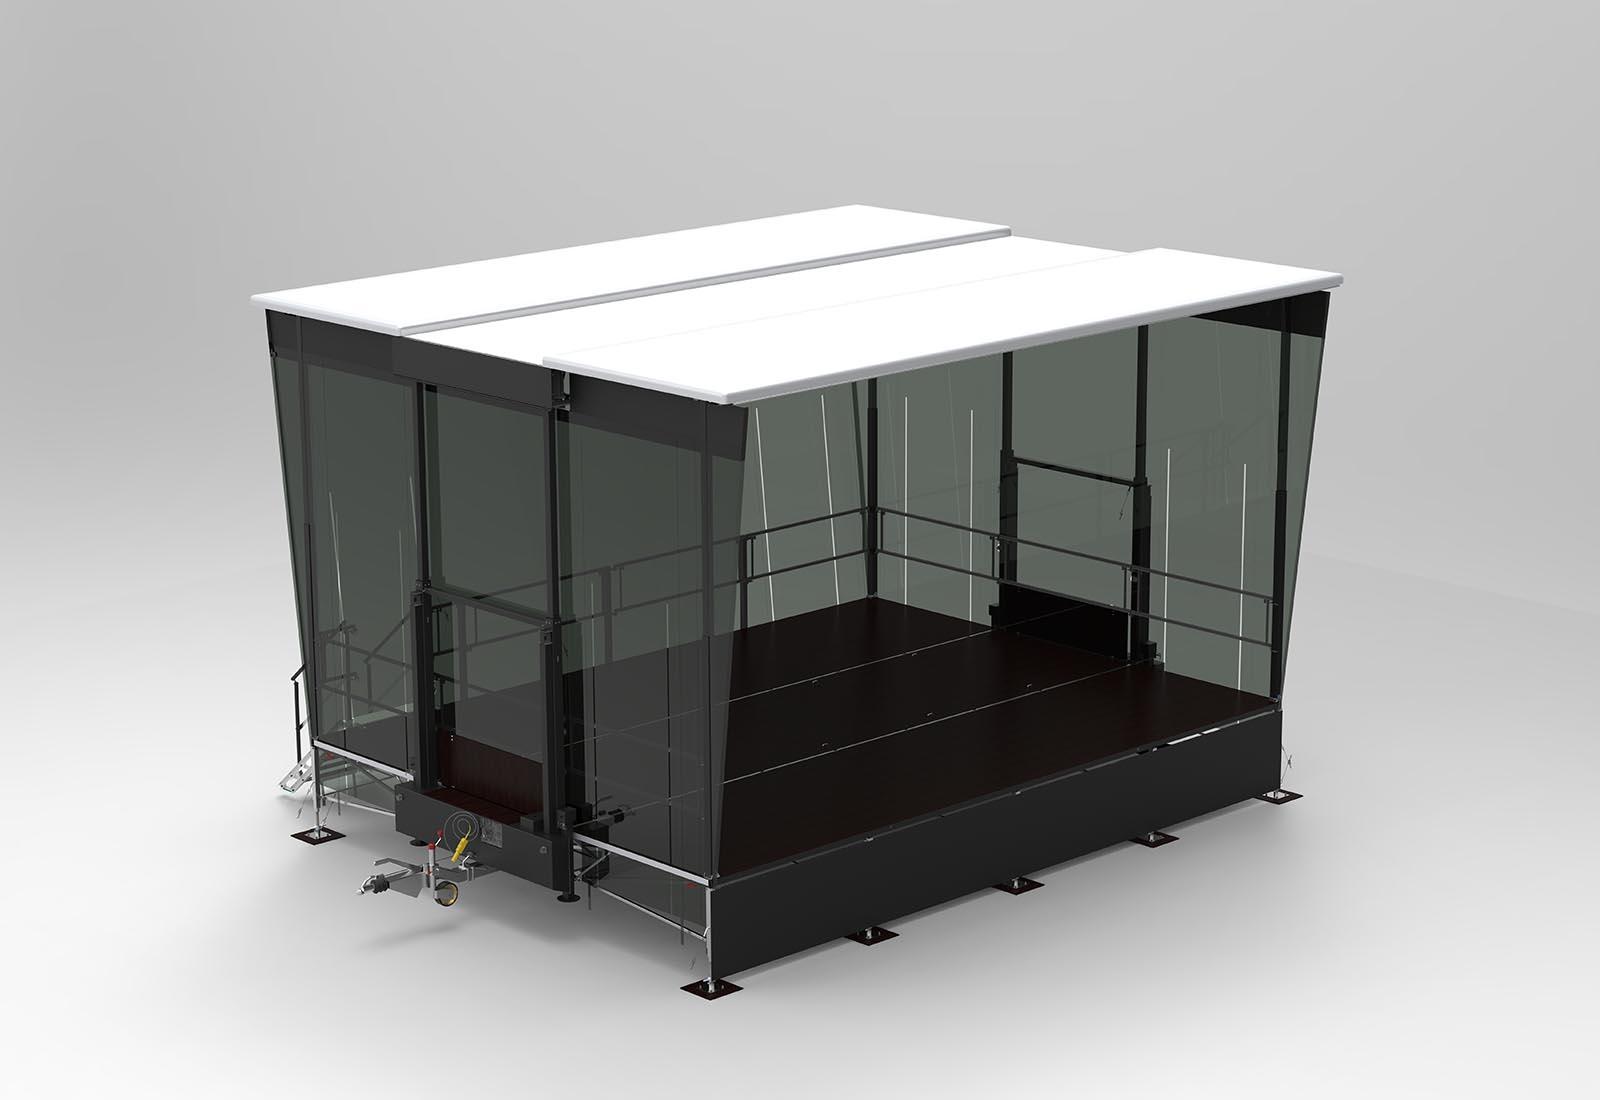 Trailerbühne 8 x 6 m